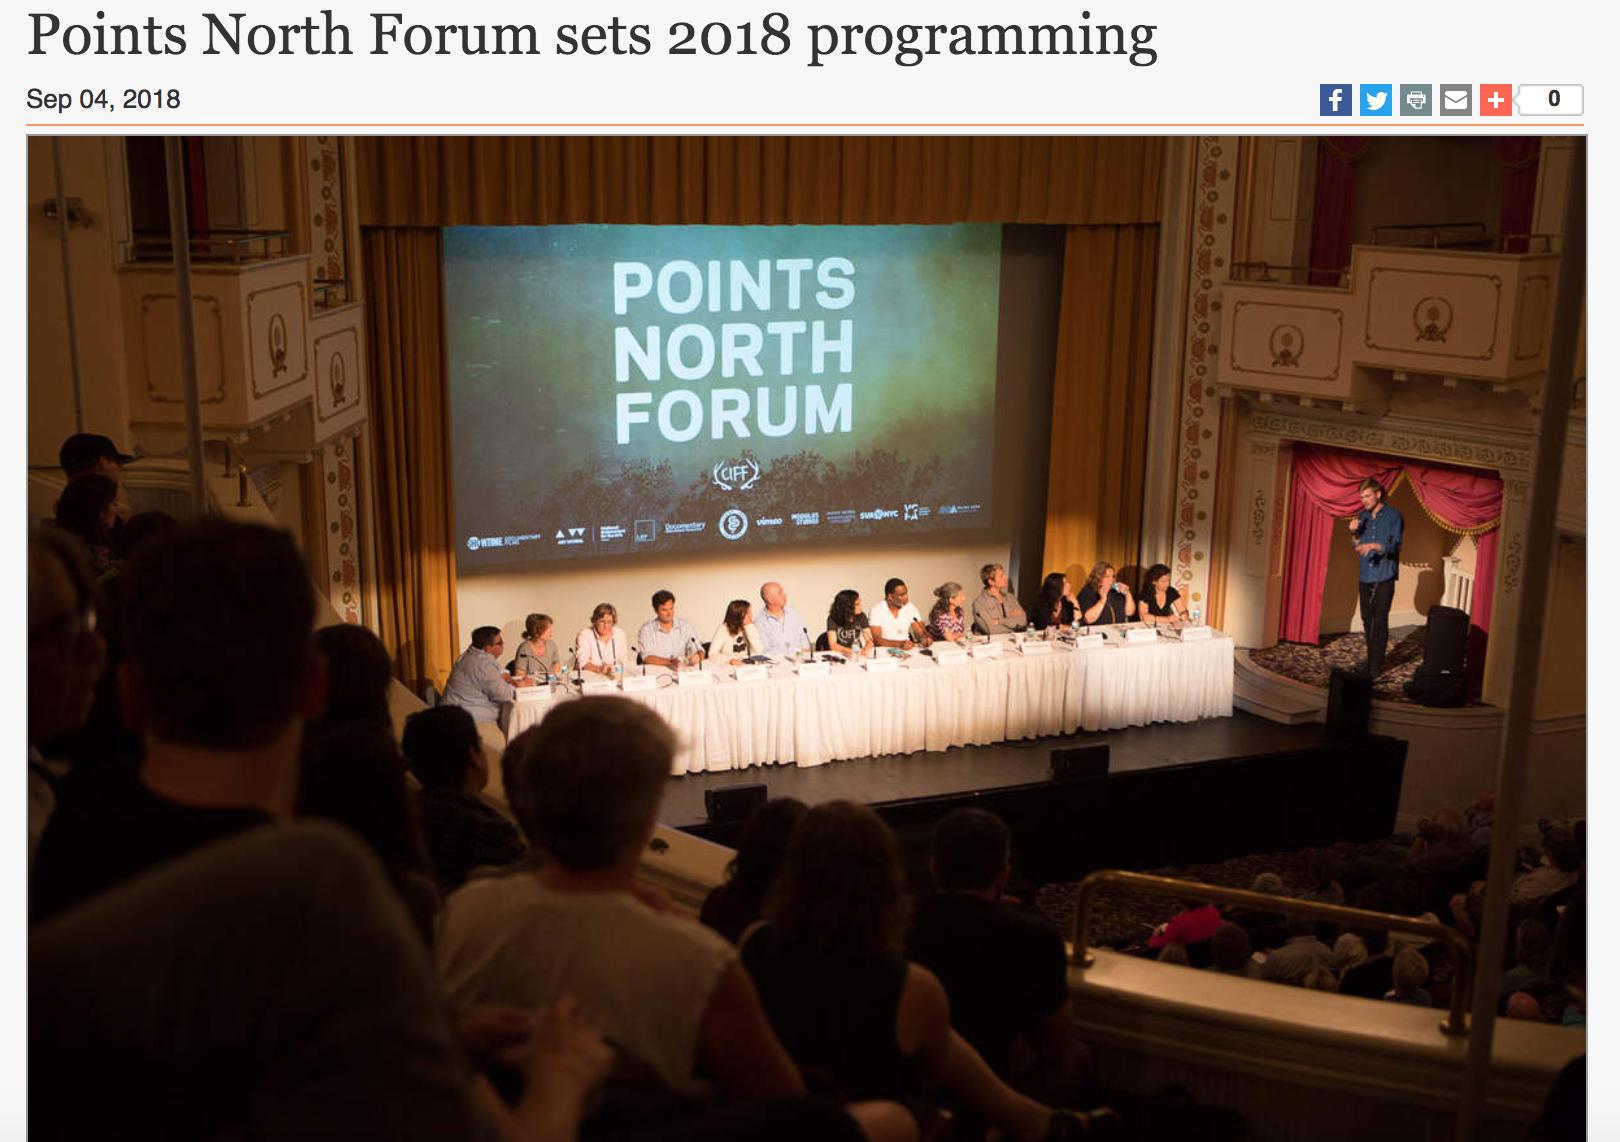 POINTS NORTH FORUM SETS 2018 PROGRAMMINGSeptember 4, 2018 | Knox Village Soup -